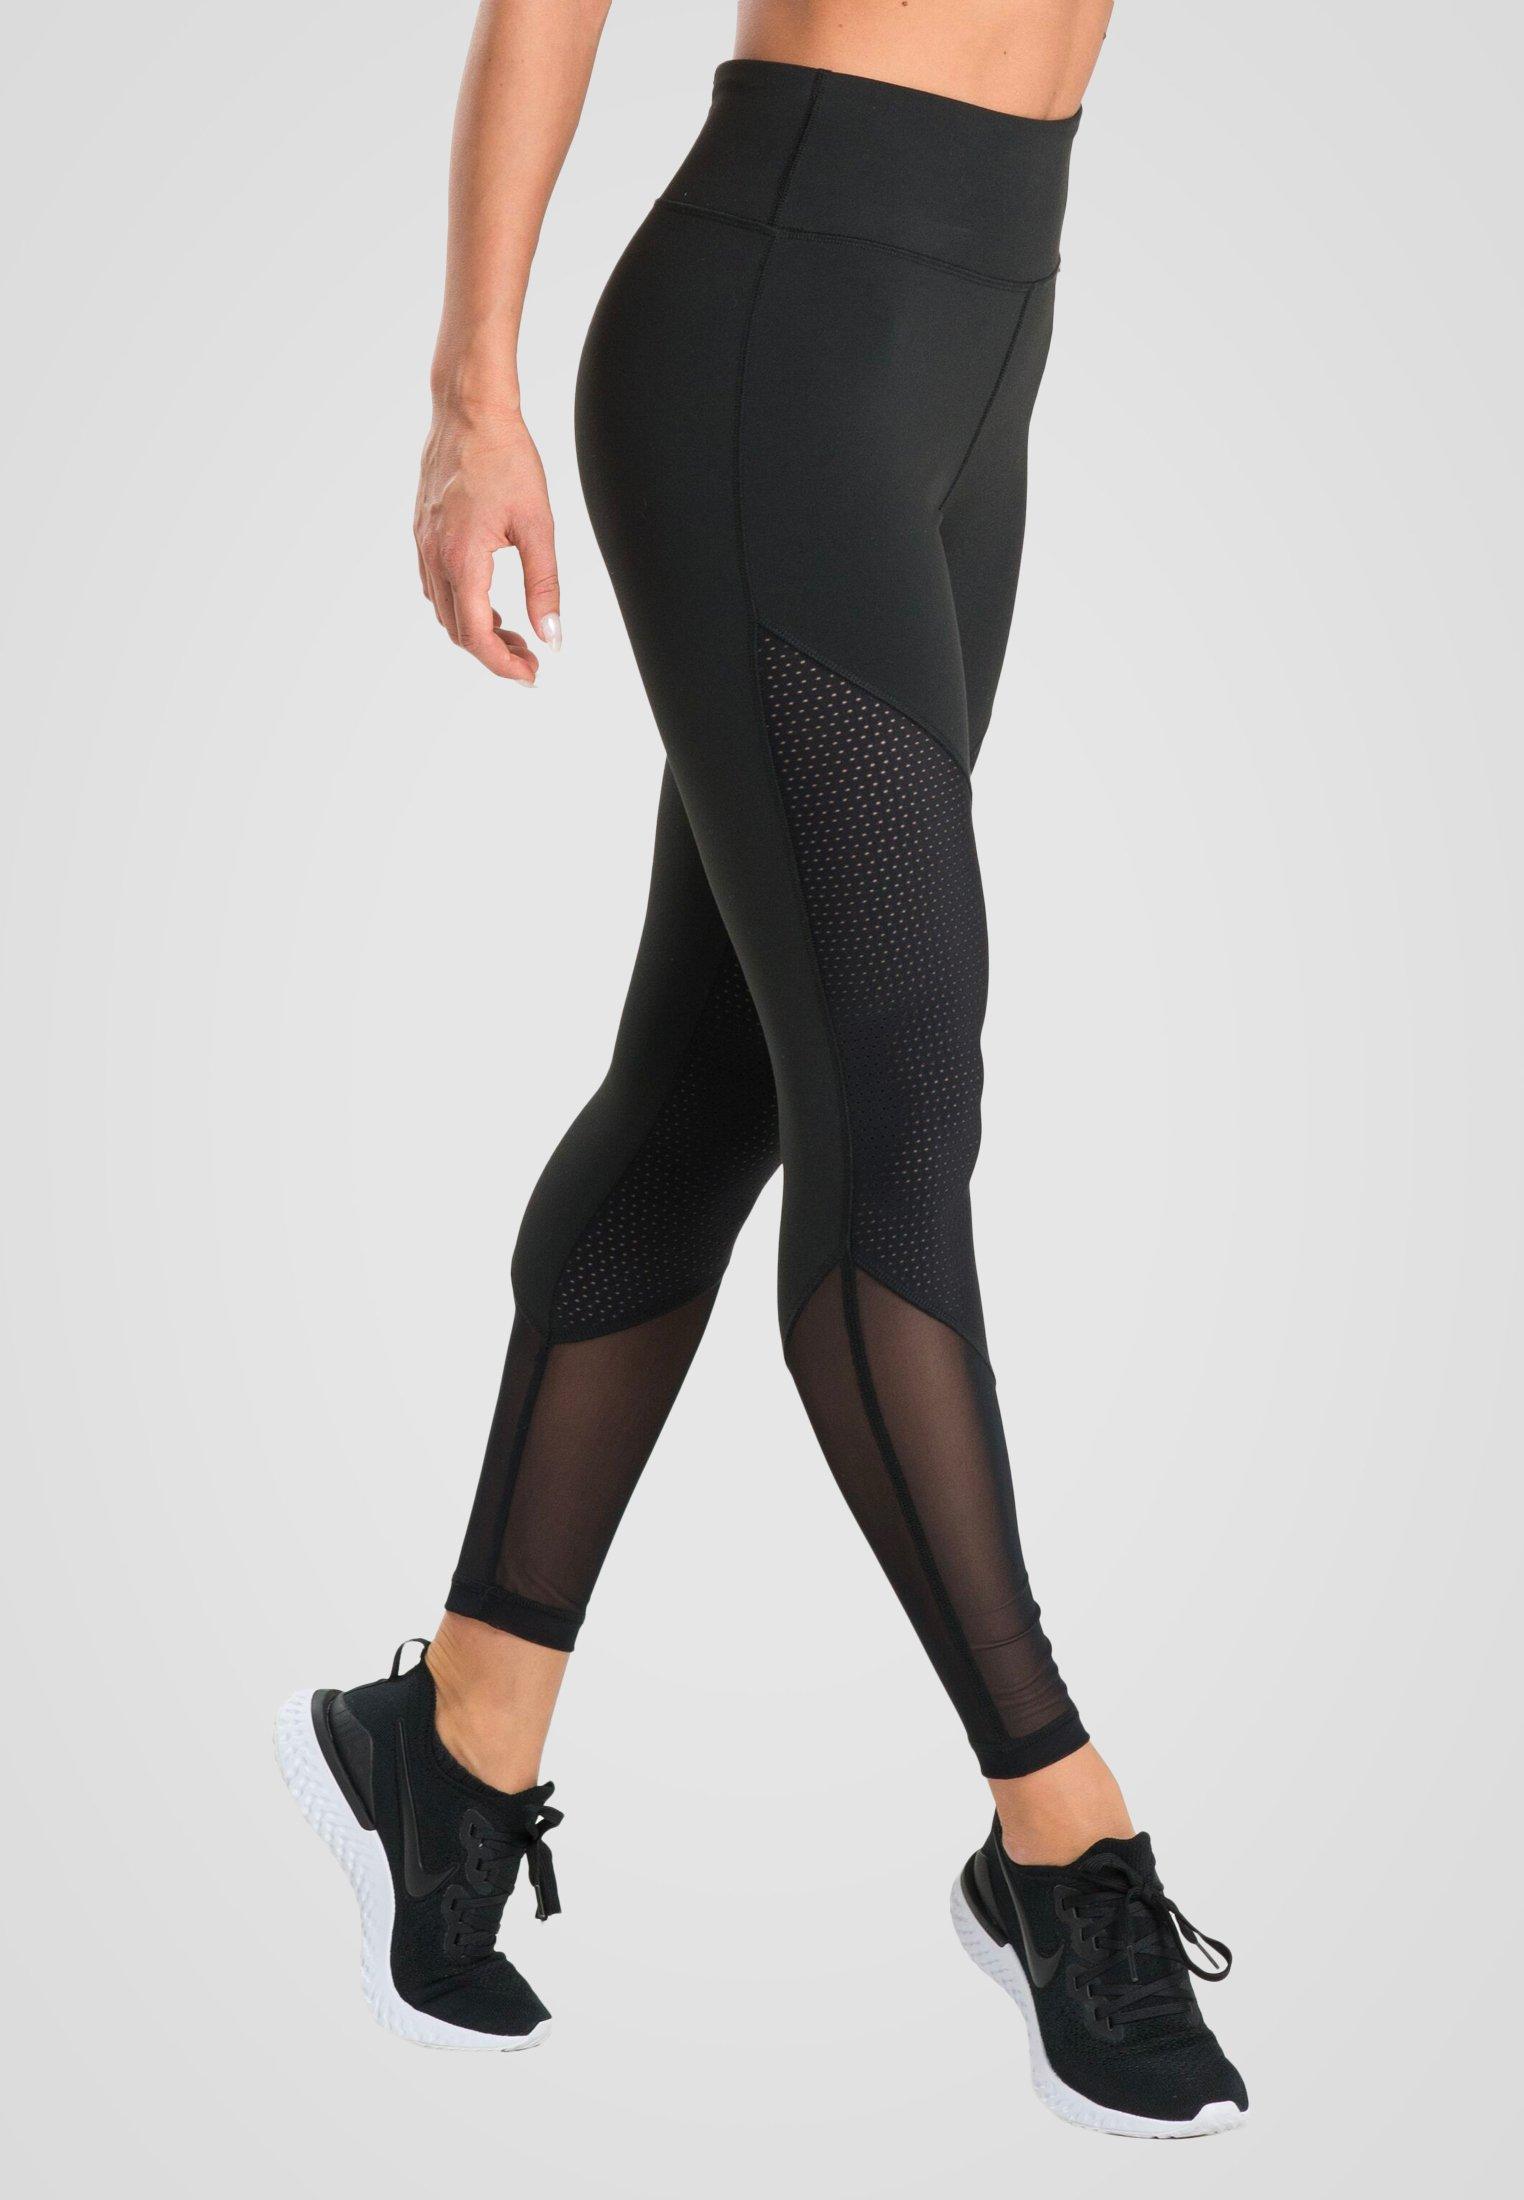 Original Ropa de mujer Zoe Leggings NYX Leggings black yYsaxb